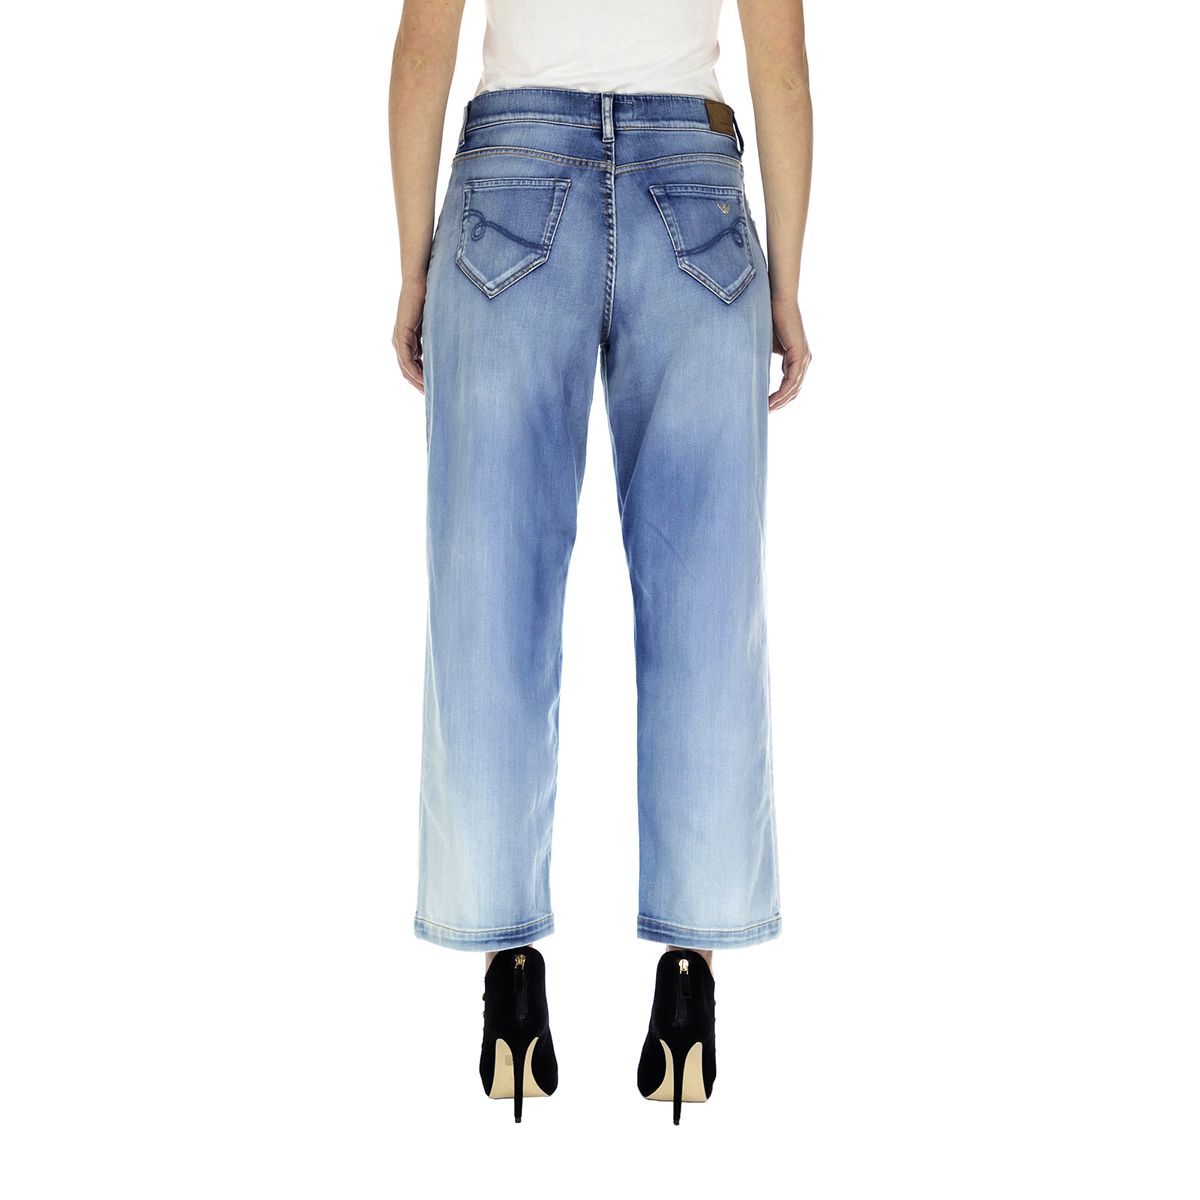 Emporio Armani 5 Pockets Pants